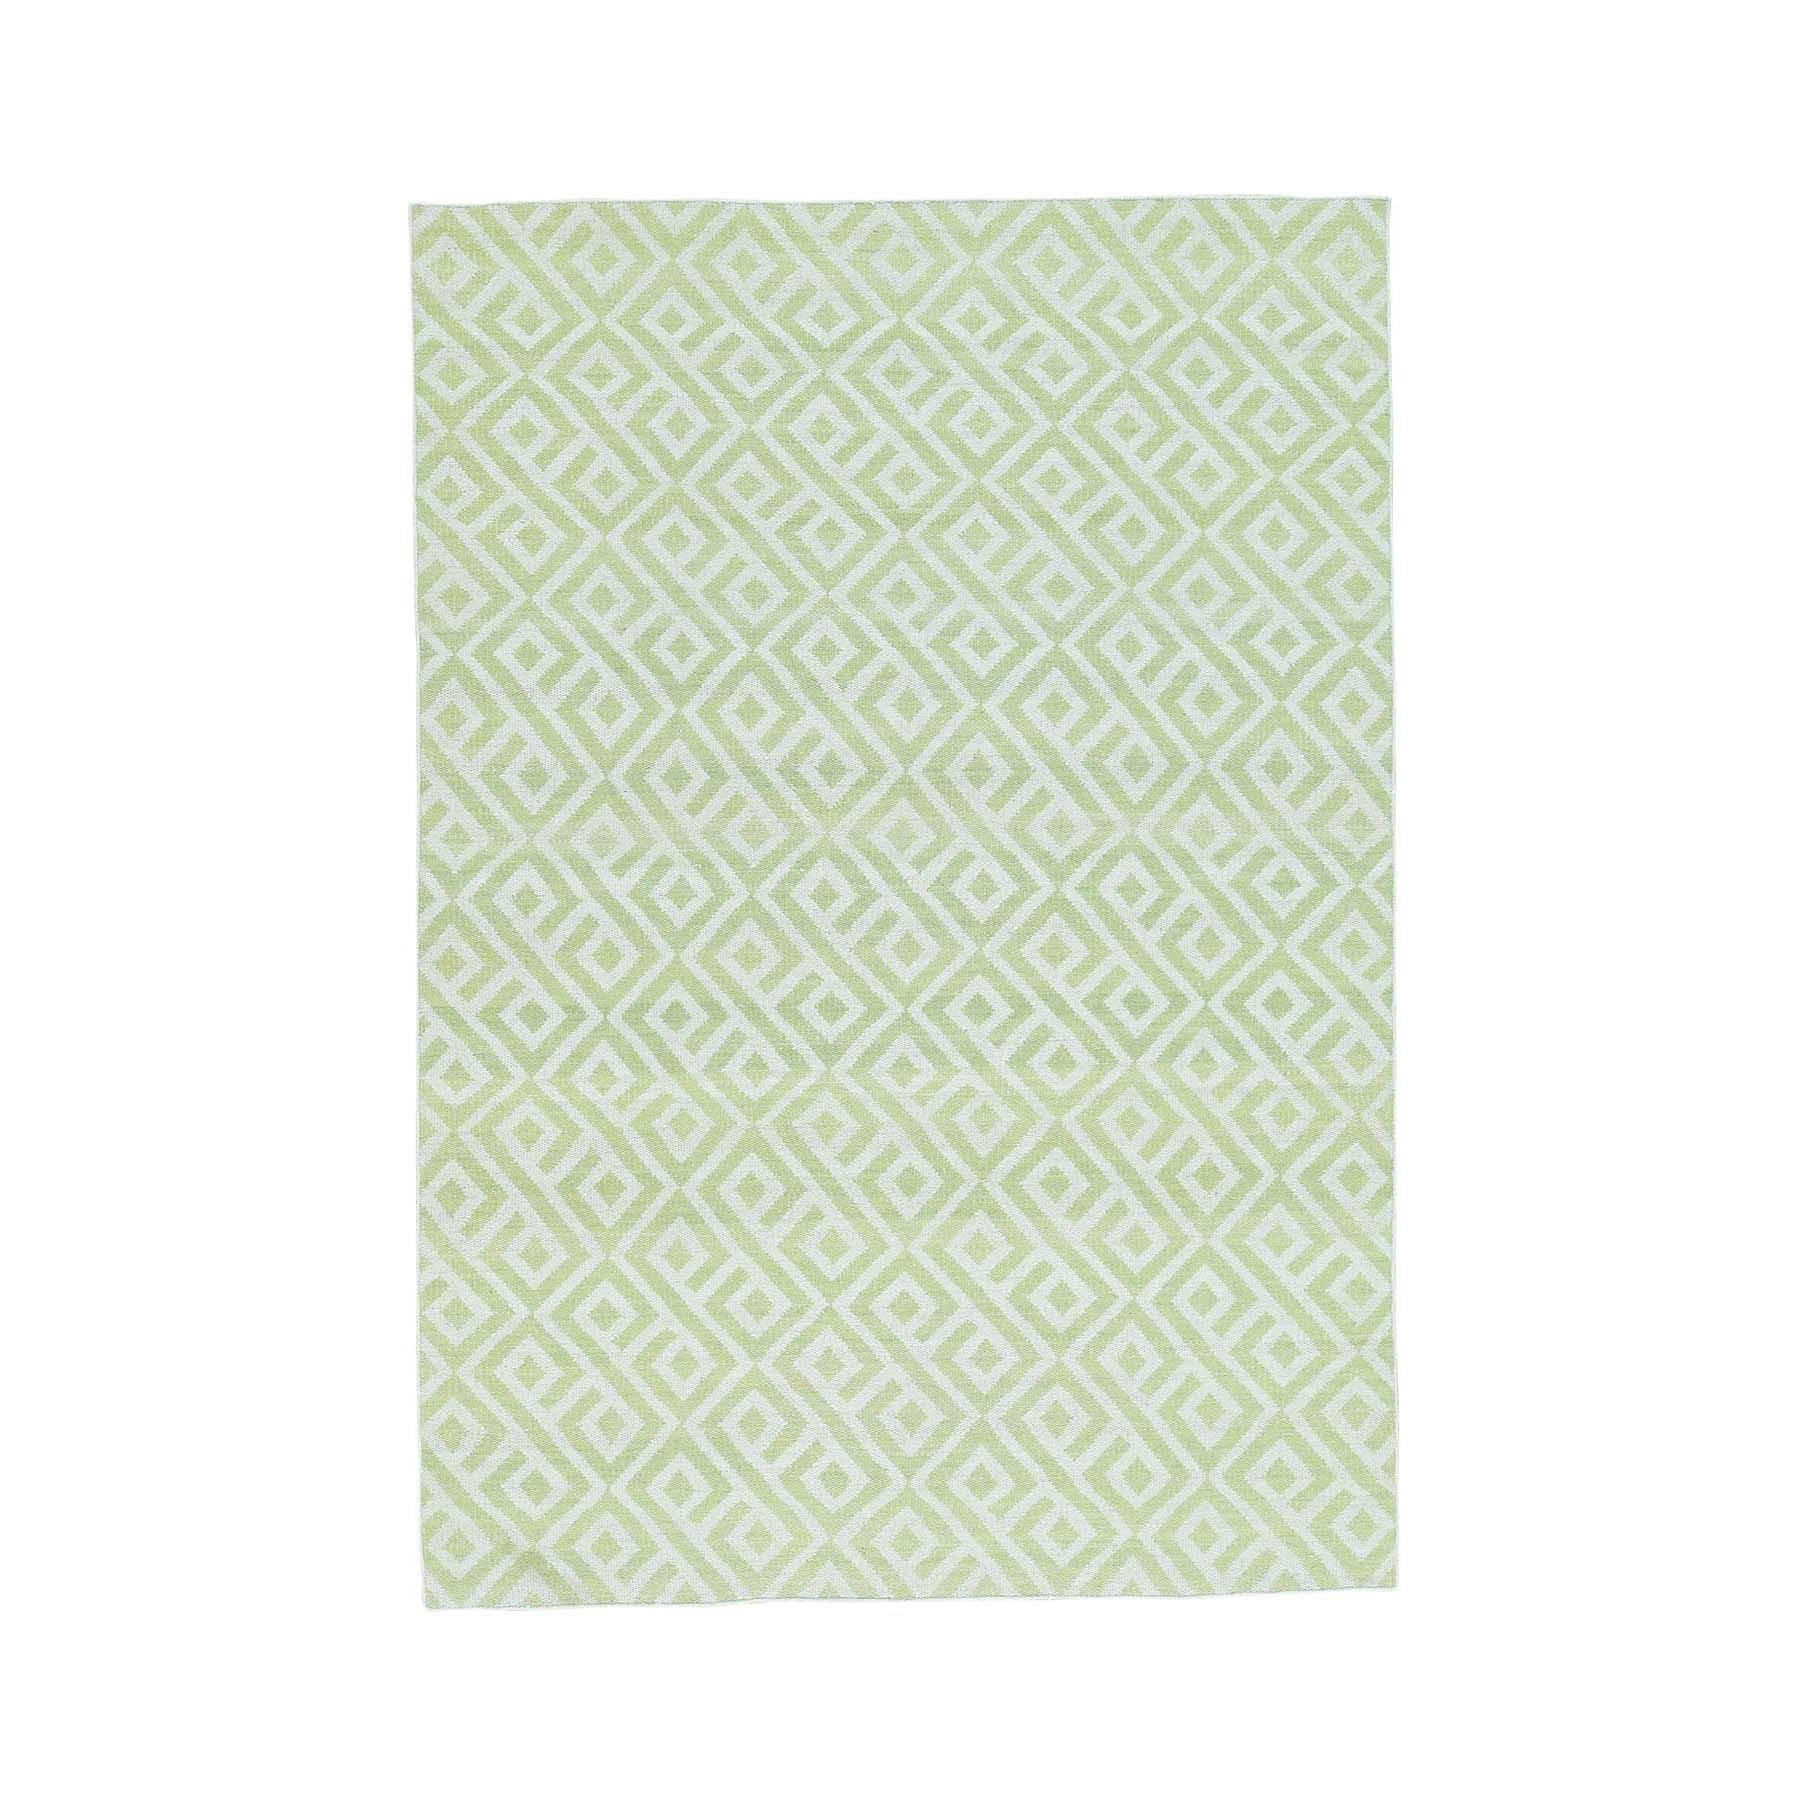 "5'x7'1"" Hand-Woven Reversible Kilim Pure Wool Flat Weave Oriental Rug"